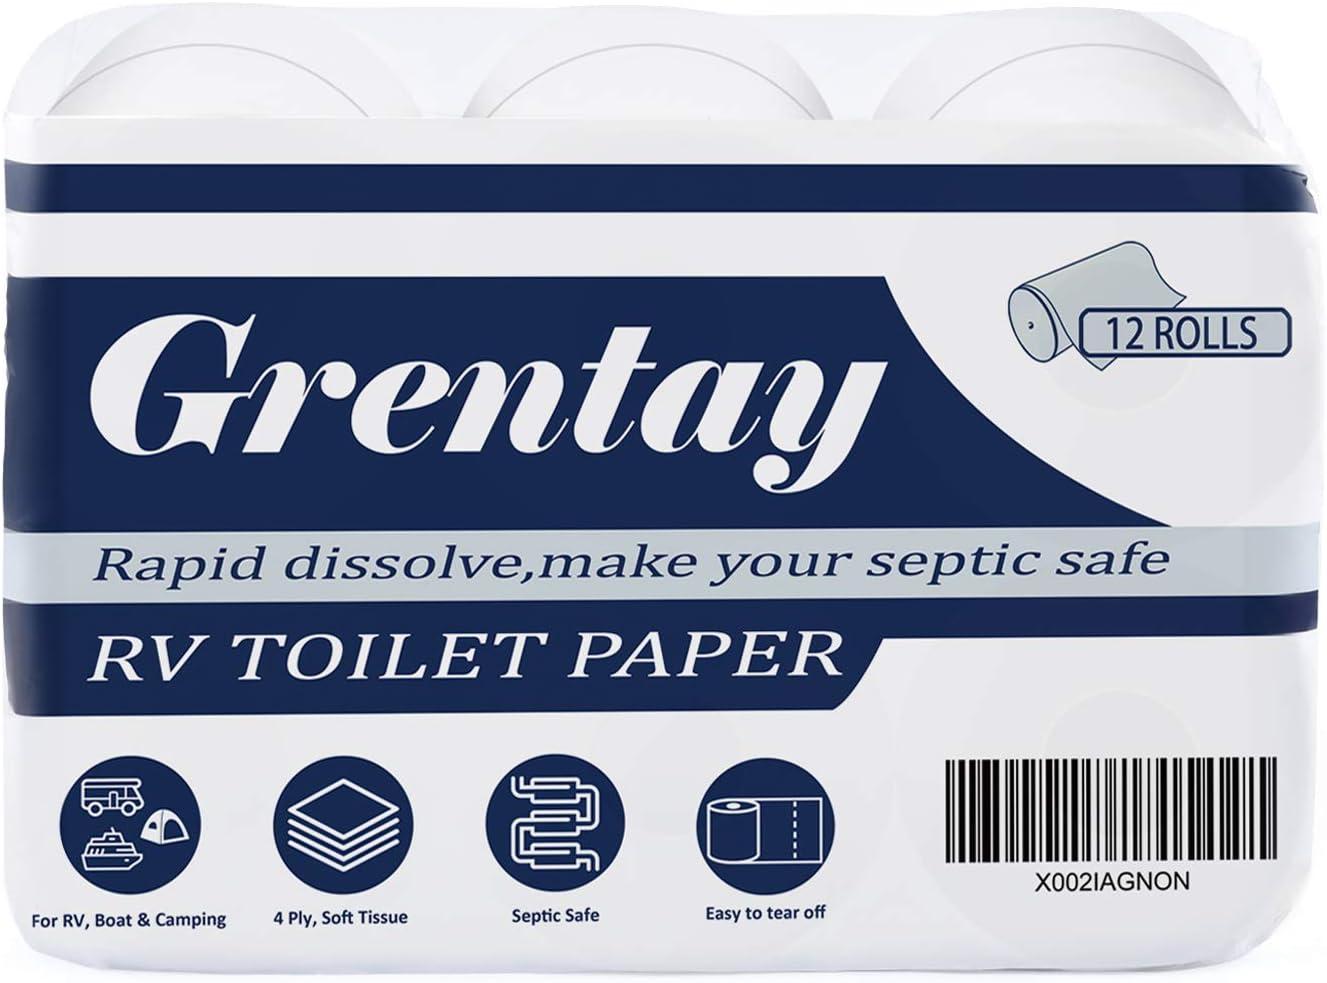 Grentay RV Toilet Paper